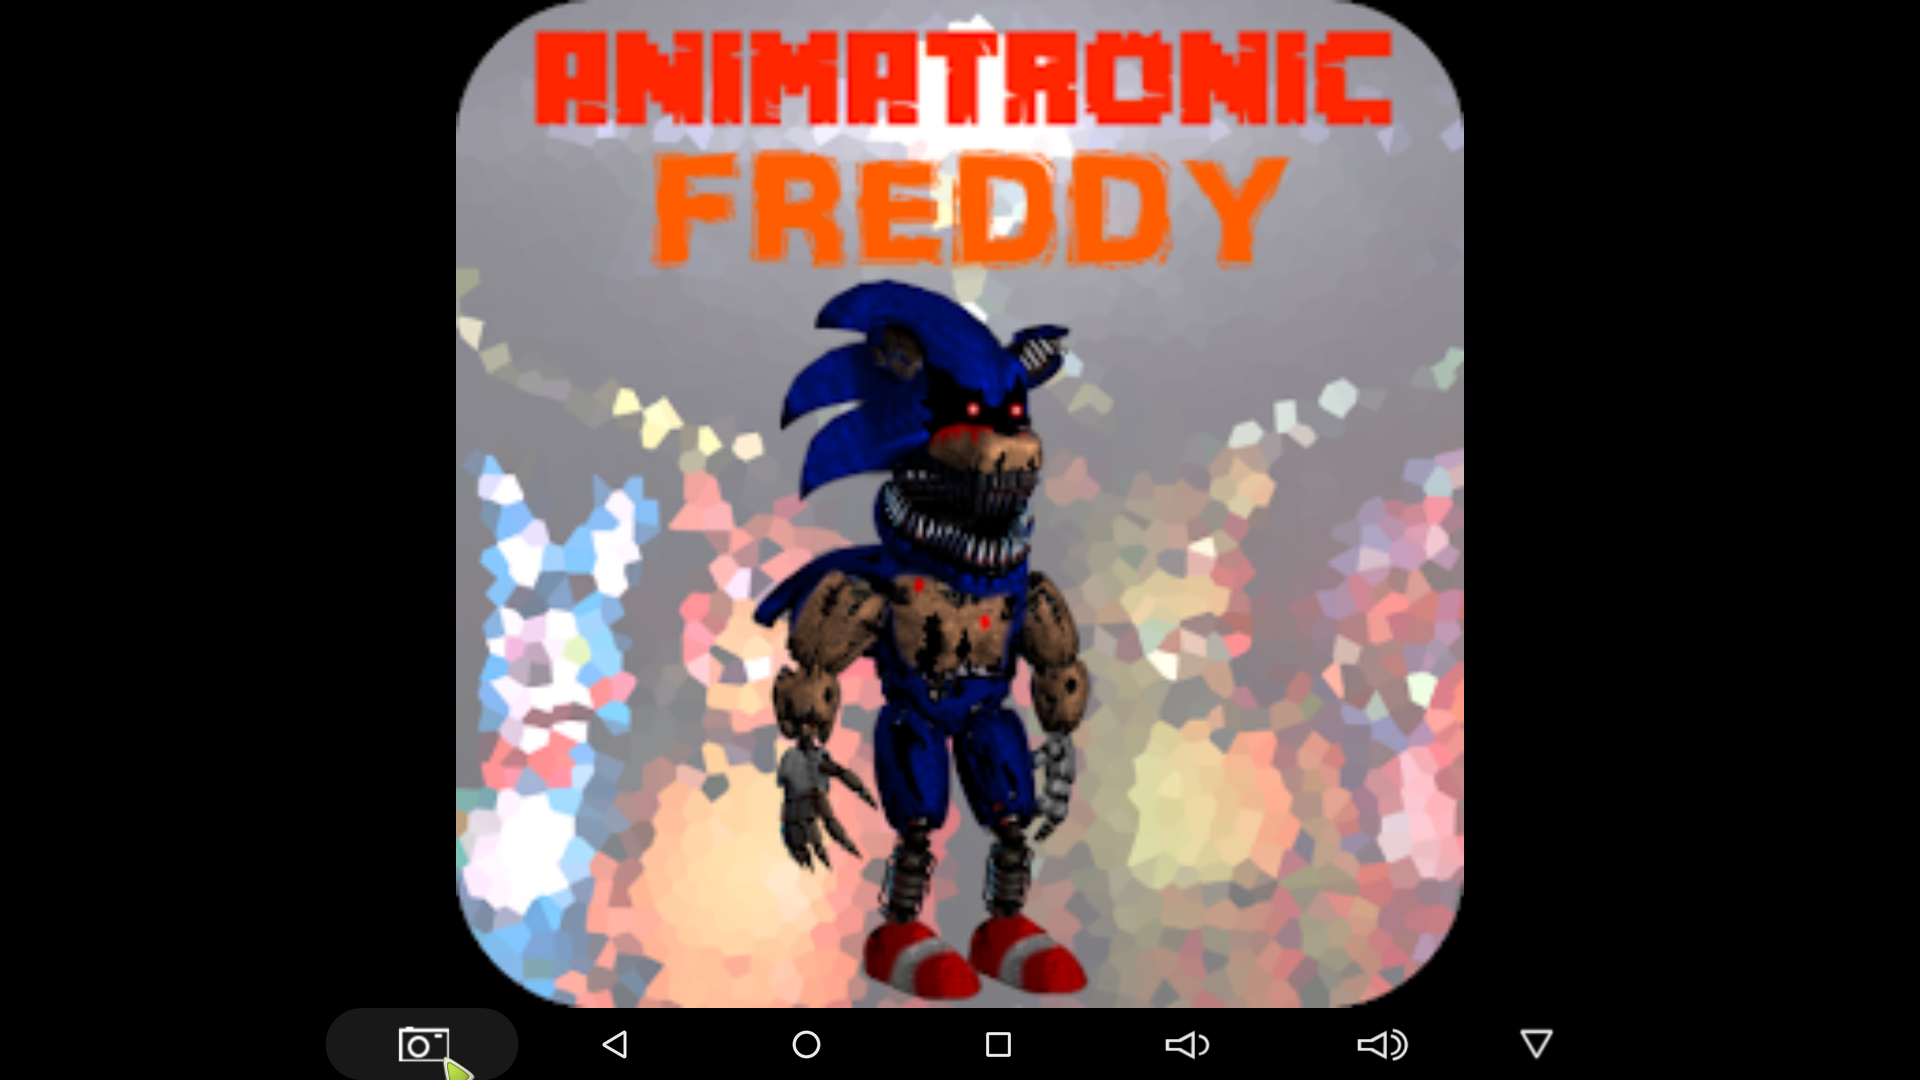 sonic animatronic fredy